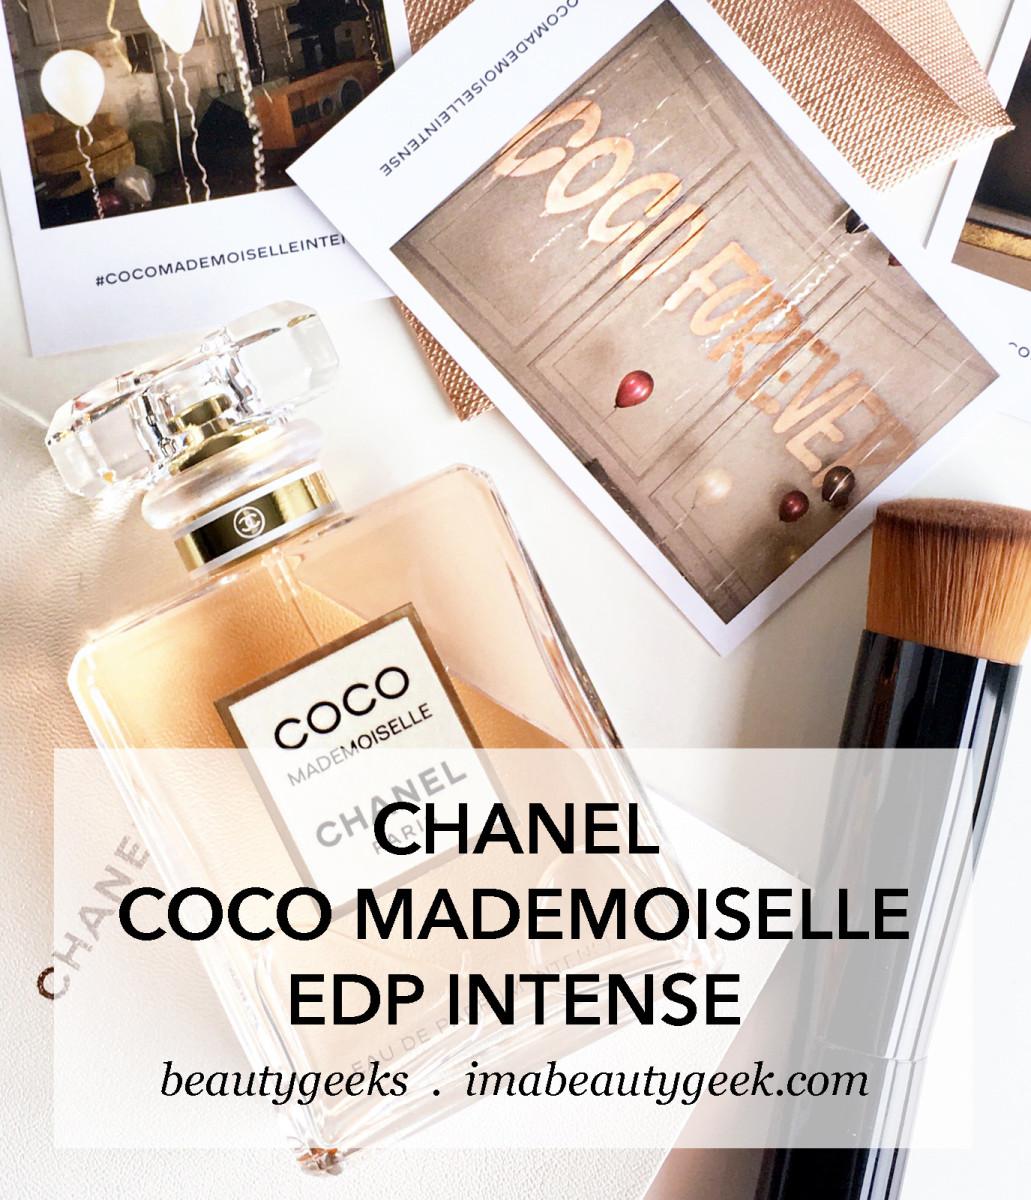 Chanel Coco Mademoiselle Eau De Parfum Intense Beautygeeks